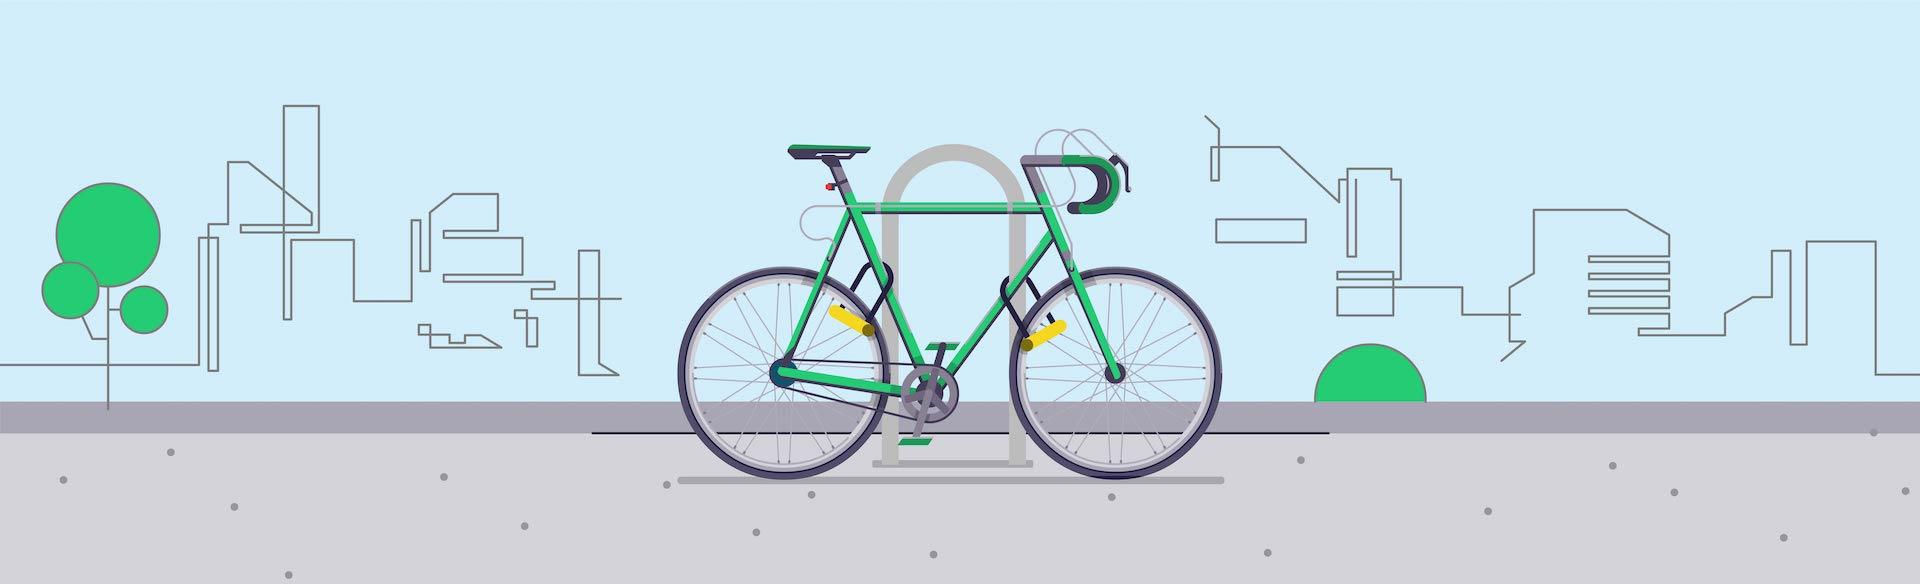 Anti-theft 1.0: The basics of bike locking